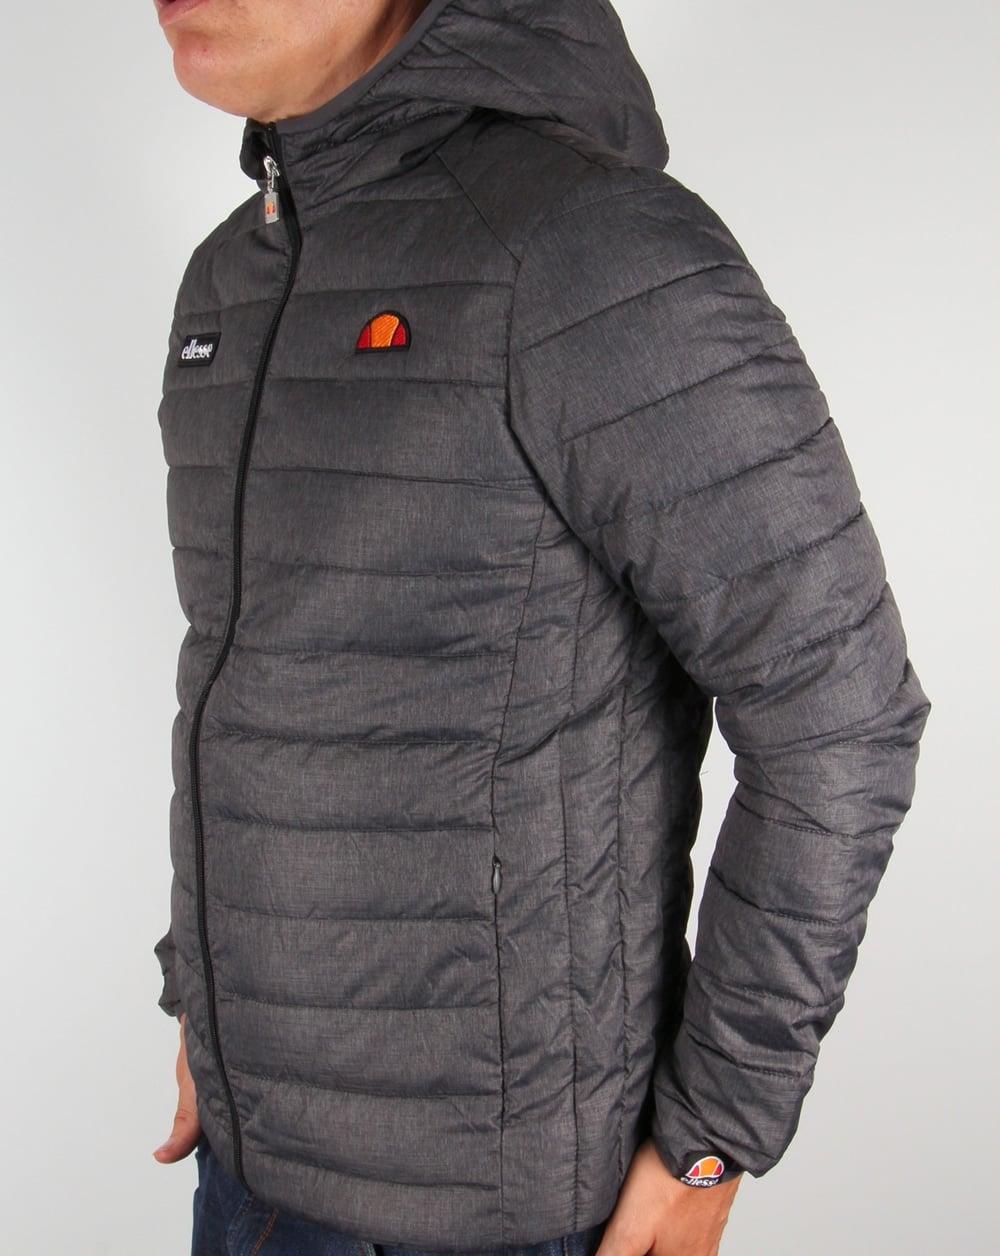 ab07b84cb0 Ellesse Lombardy Bubble Jacket Graphite Grey